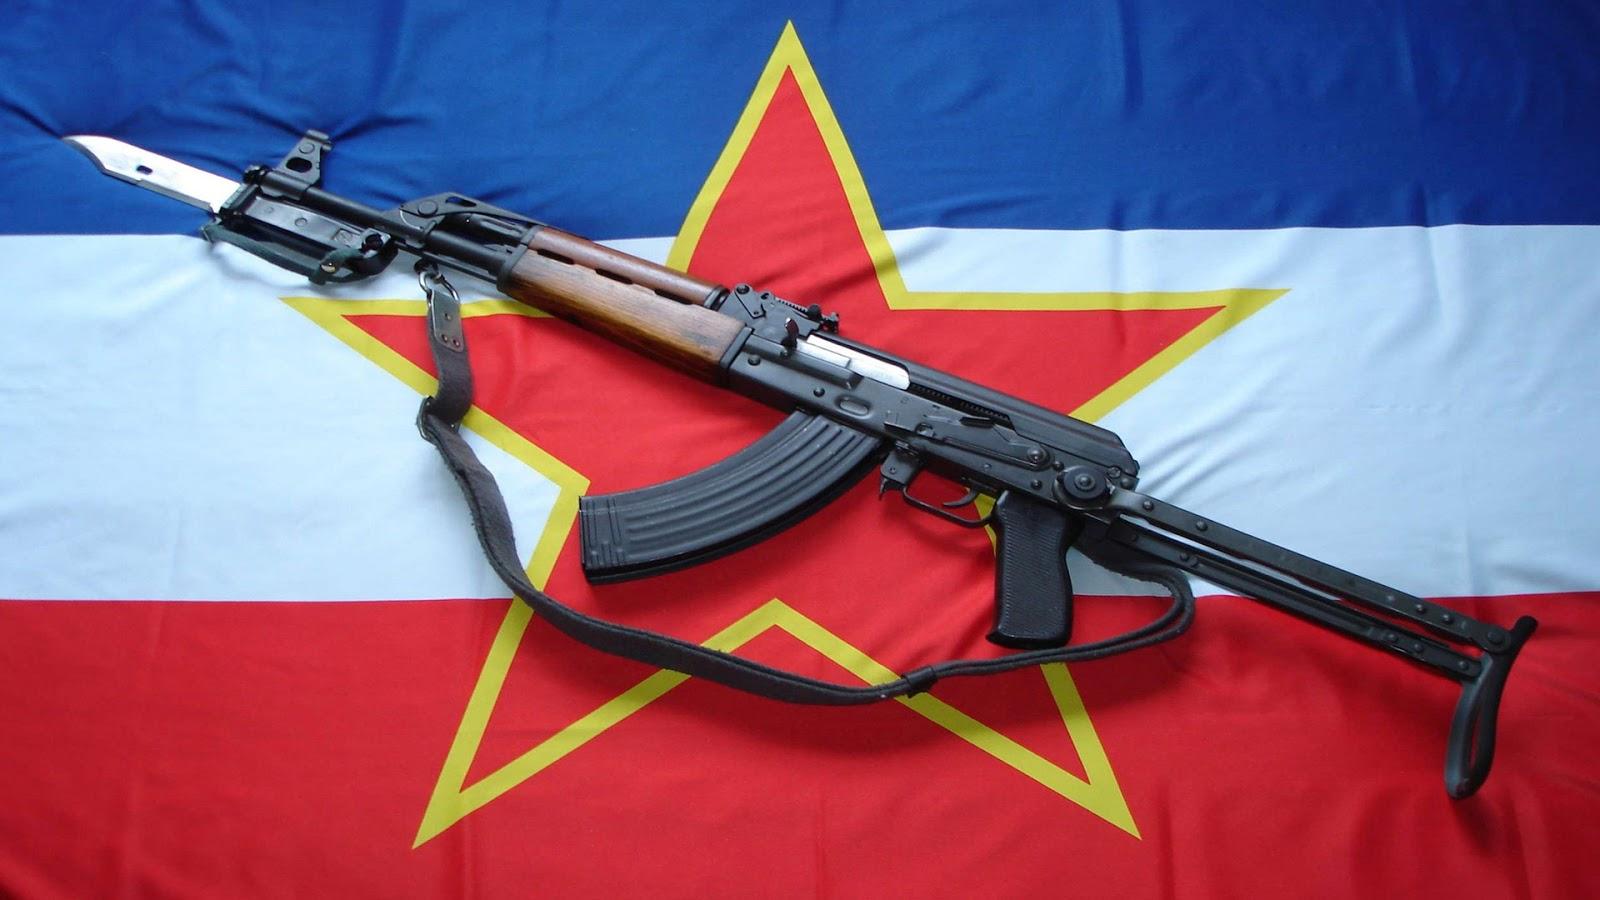 http://2.bp.blogspot.com/-RXa0UnxtCos/UQ7Nqy3mRTI/AAAAAAAAI5o/scrkNJKggew/s1600/flag-wallpaper-Yugoslavia-star-guns-automatic-bayonet.jpg